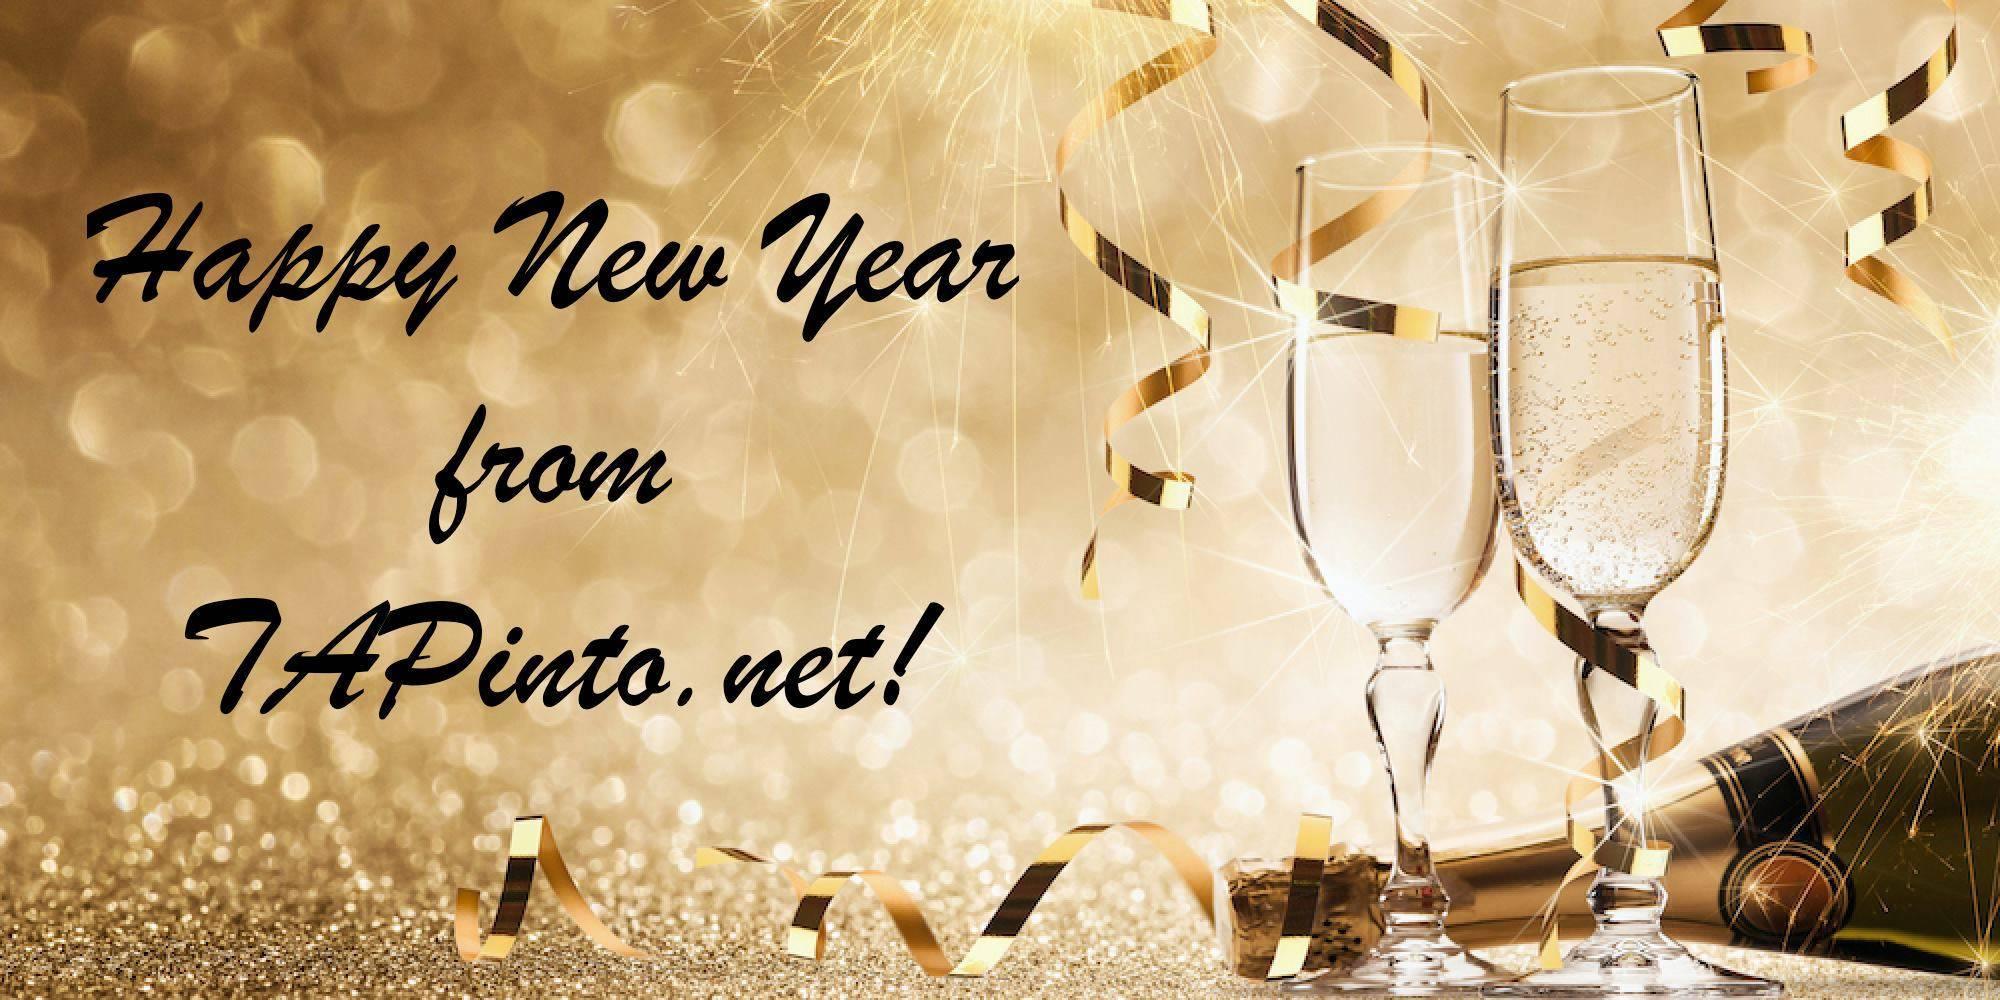 53452e0c9fbdc830843c_TAPinto_Happy_New_Year_b.jpg